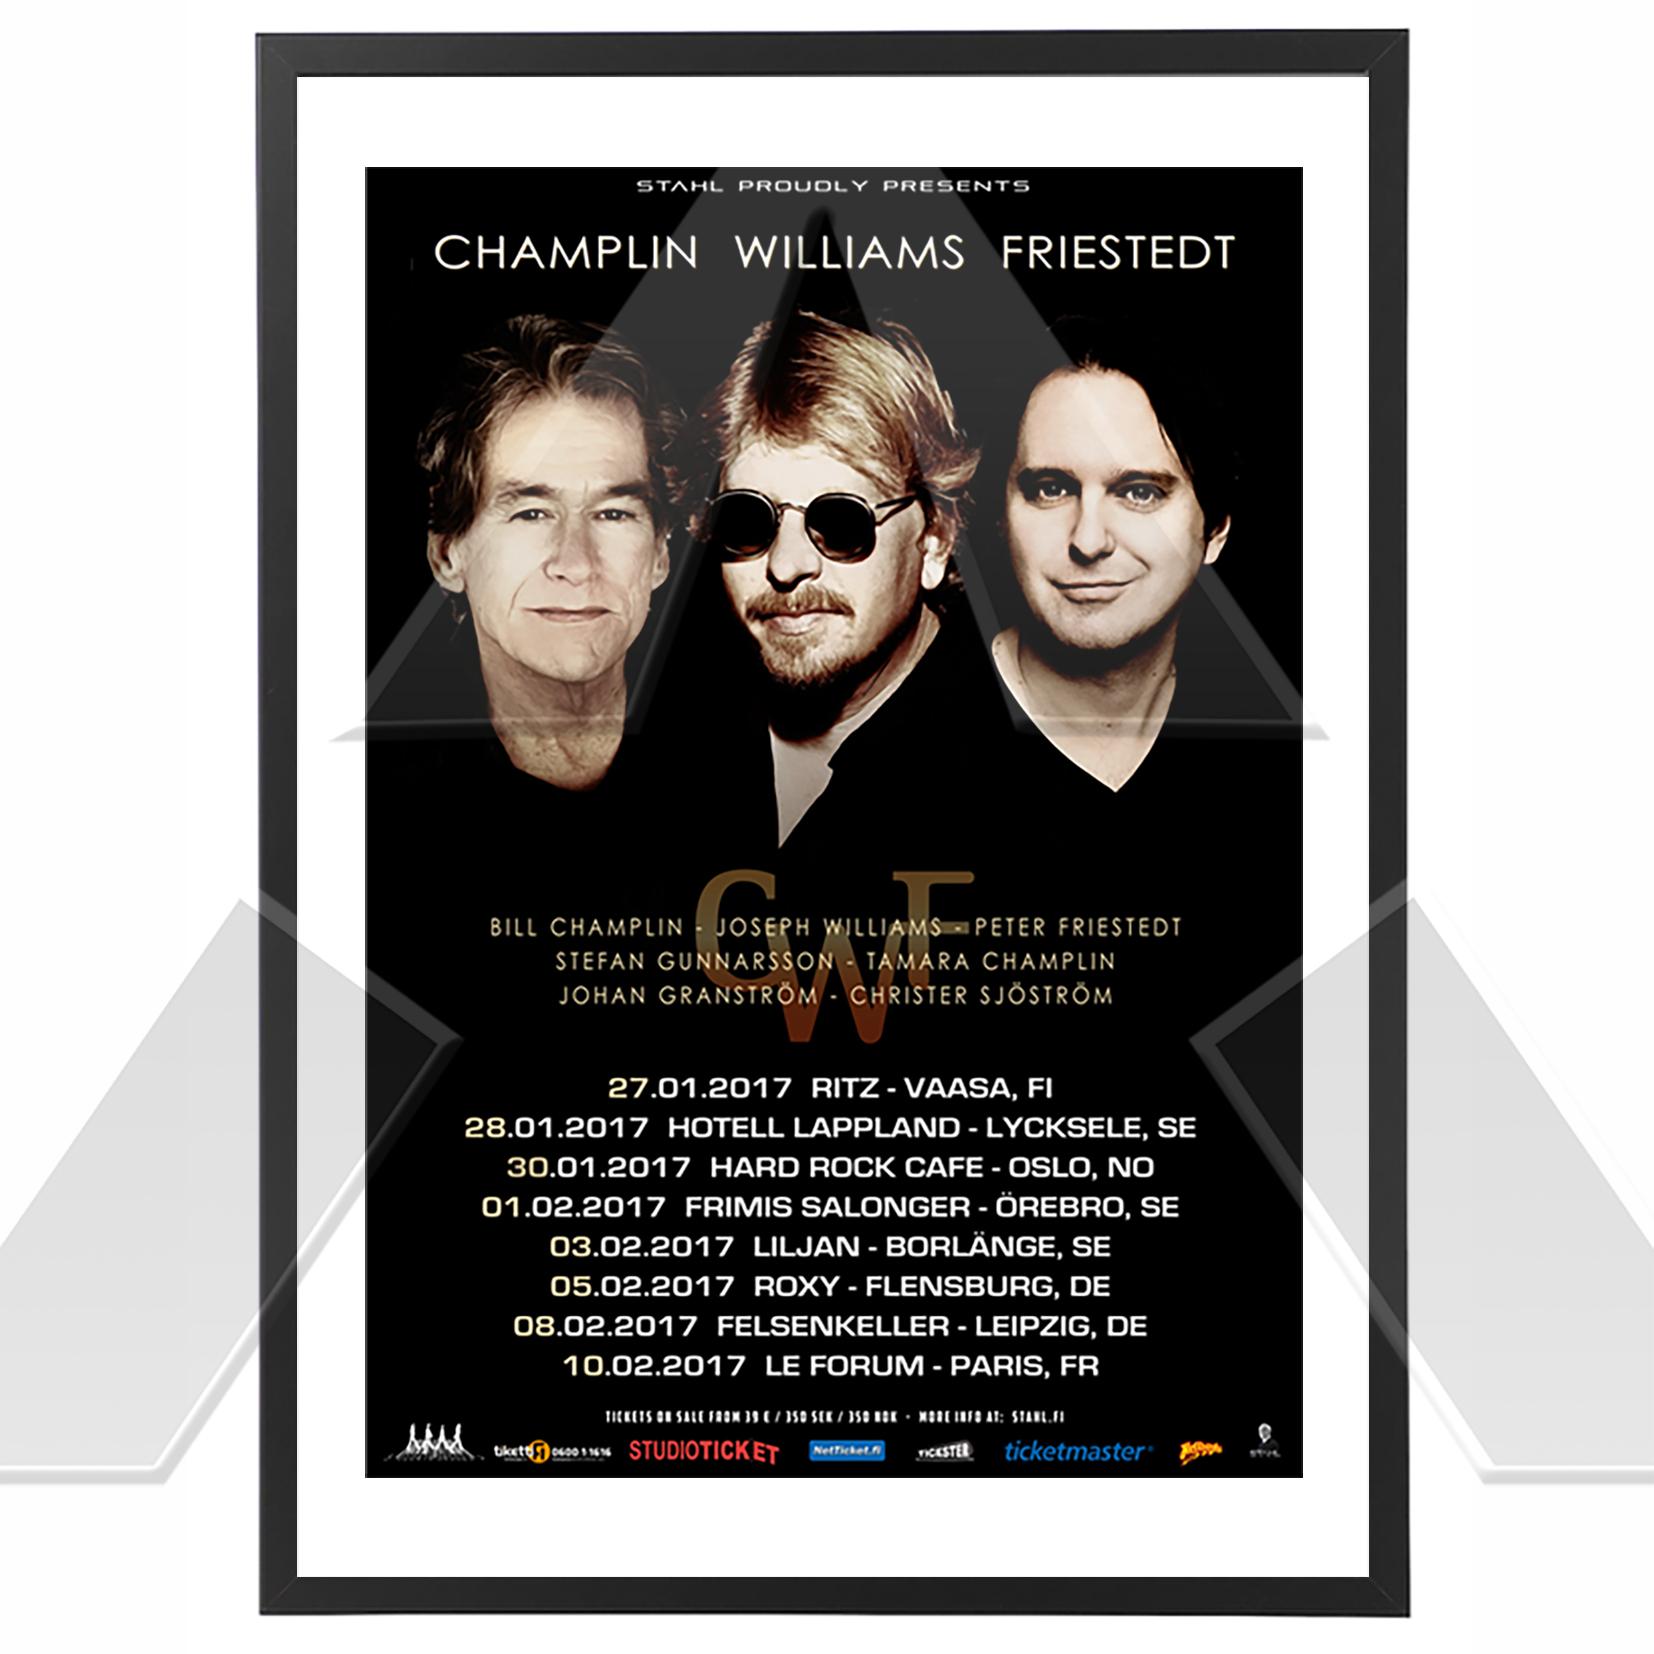 Champlin Williams Friestedt ★ European Tour 2017 (tour poster)